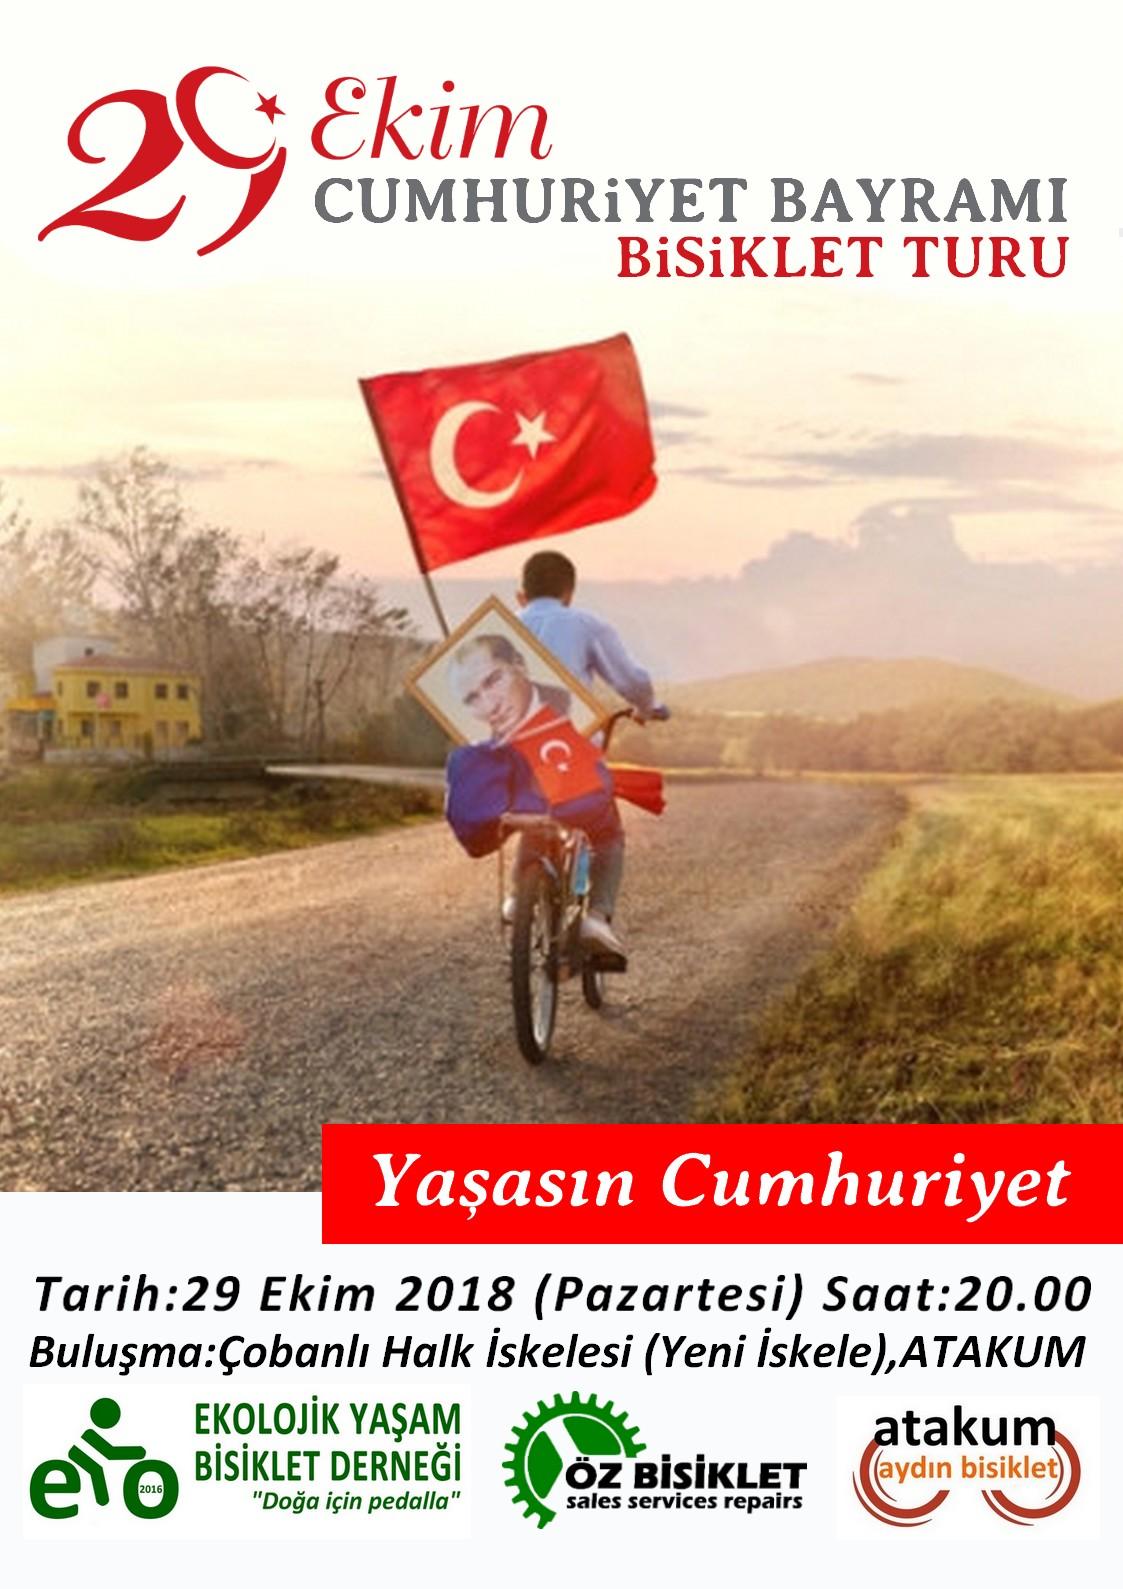 Cumhuriyet Bayramı Bisiklet Turu